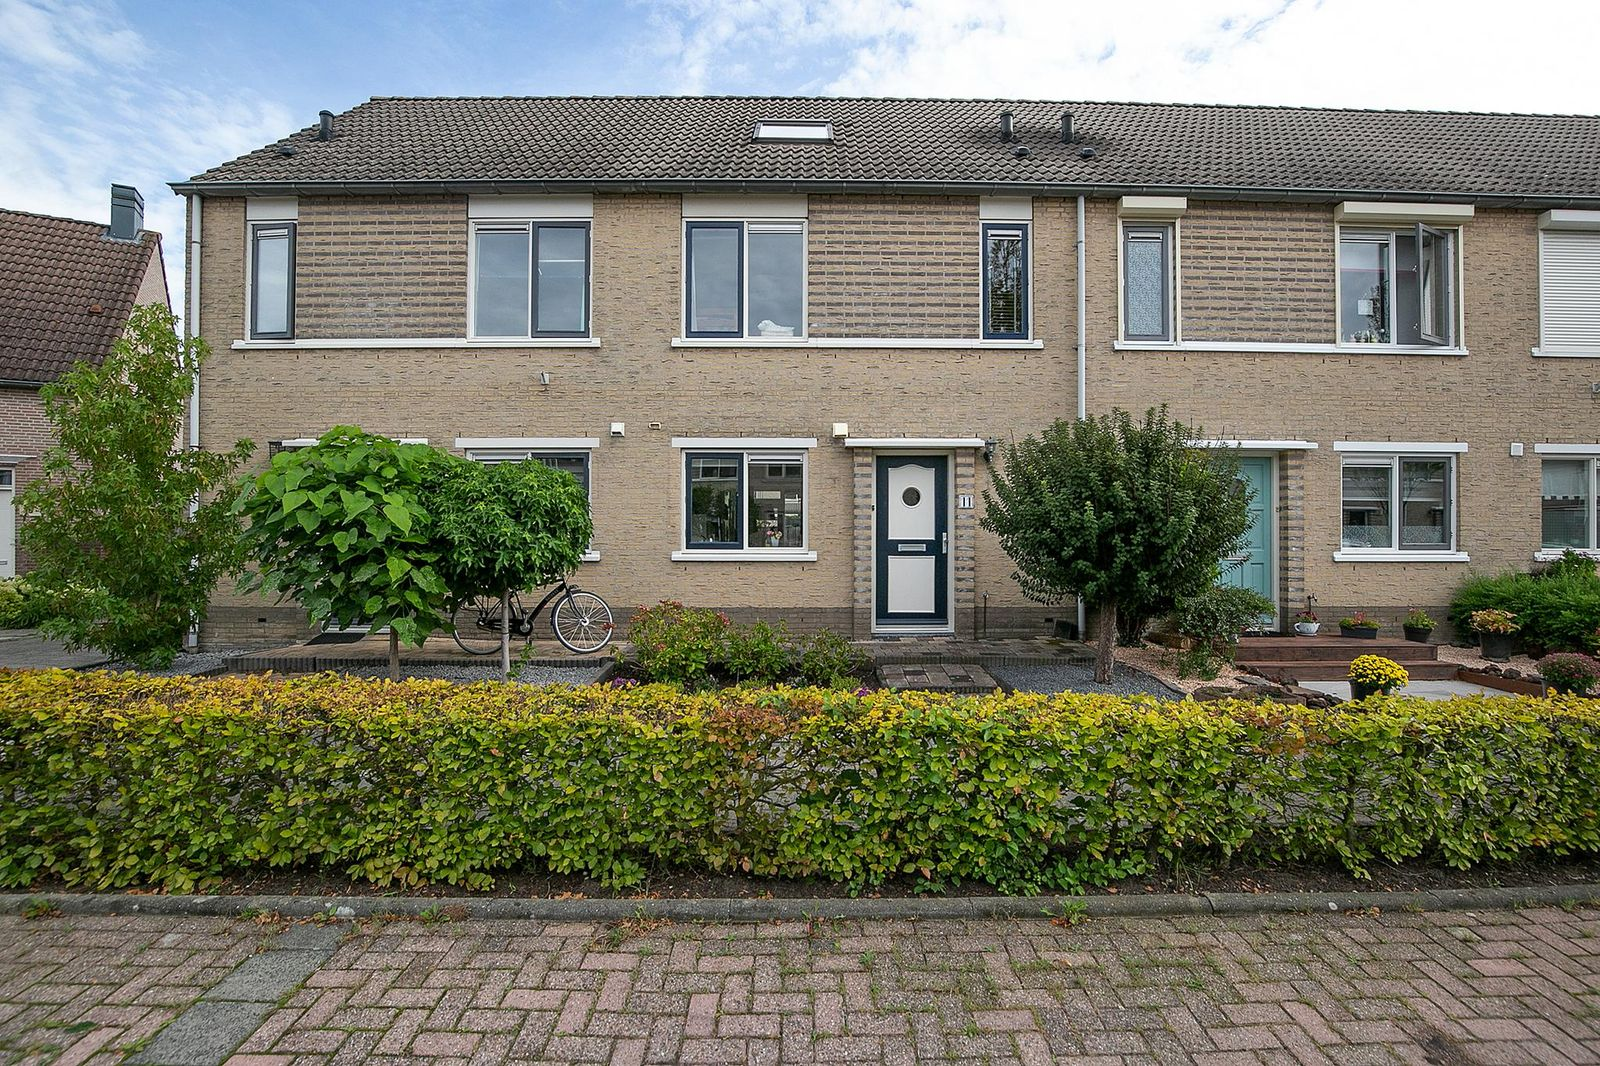 Maria van Osstraat 11, Hendrik-ido-ambacht